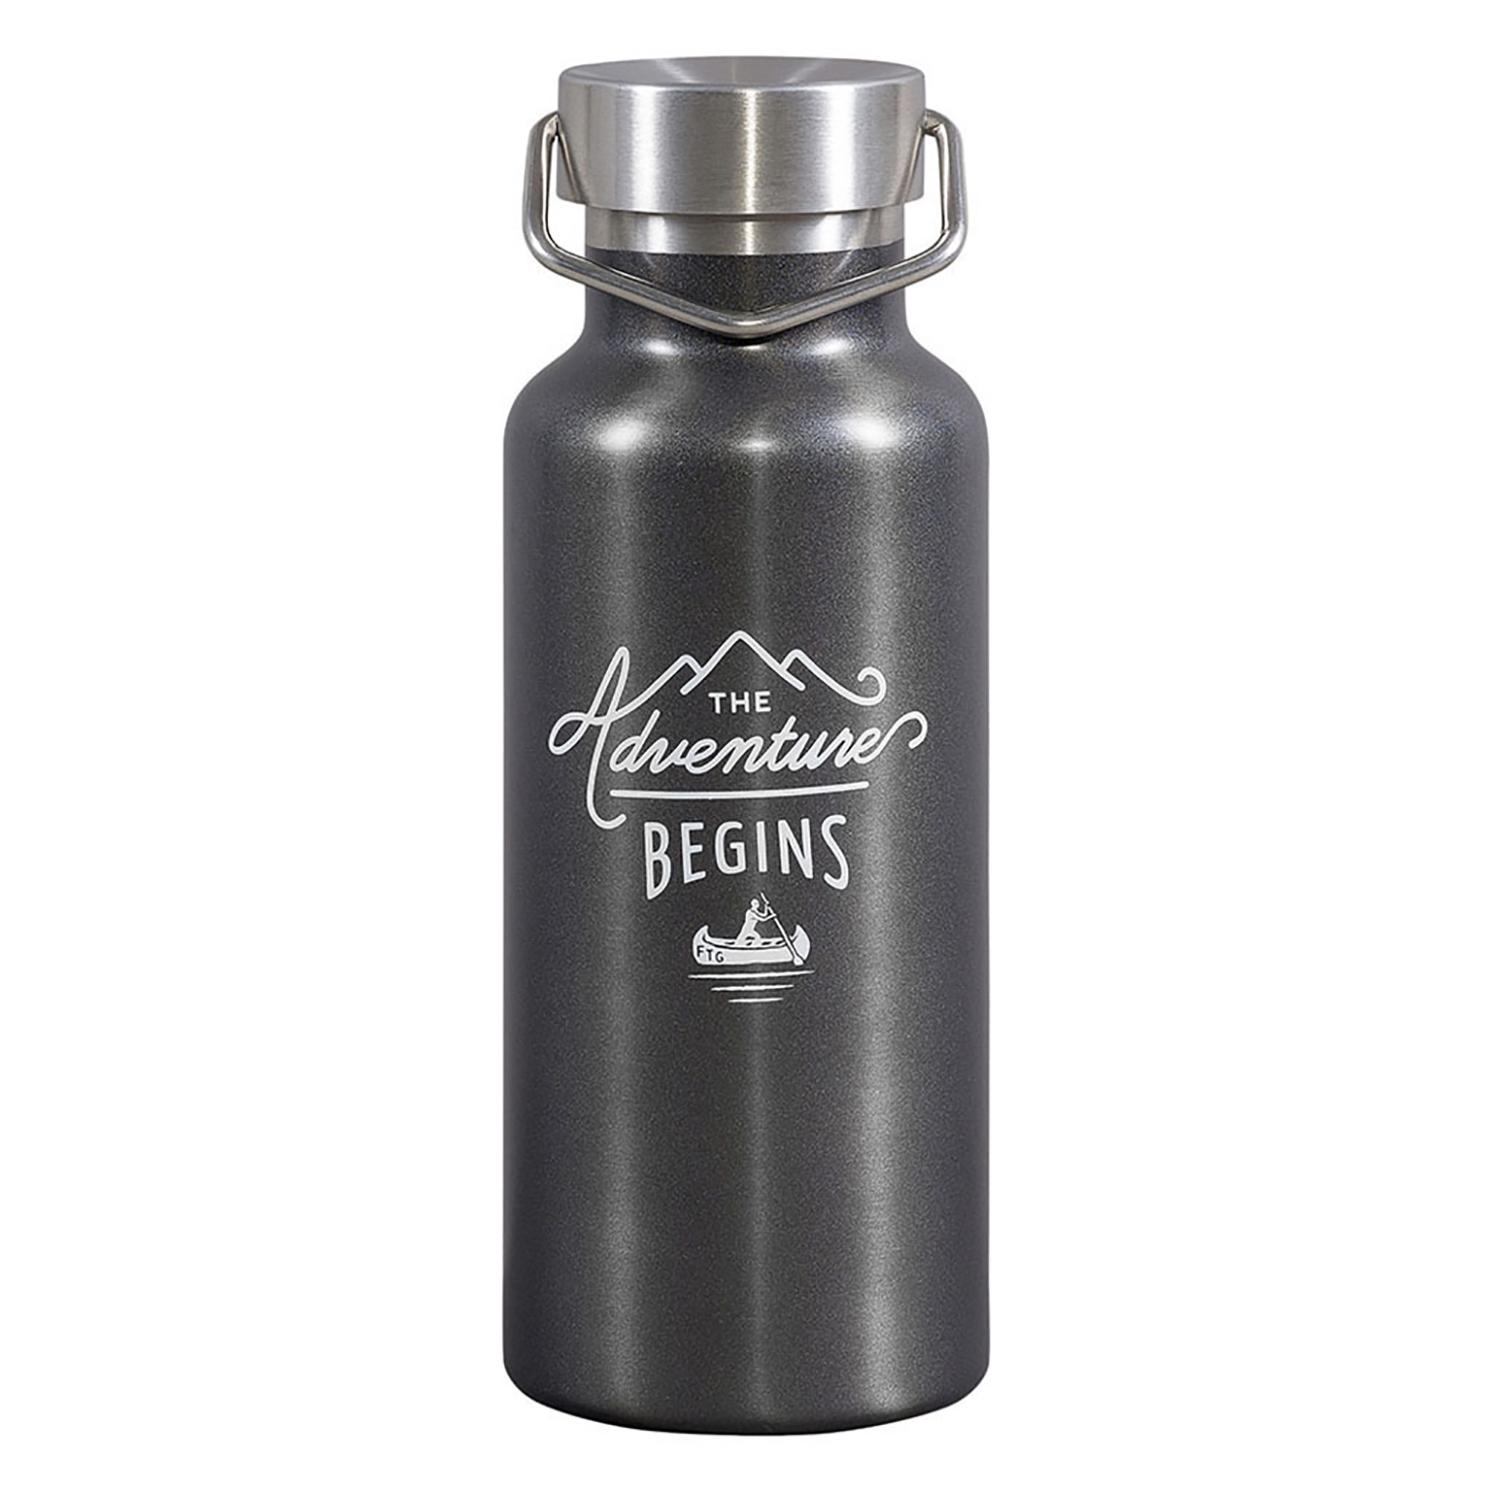 Gentlemen's Hardware – Gunmetal Stainless Steel Water Bottle